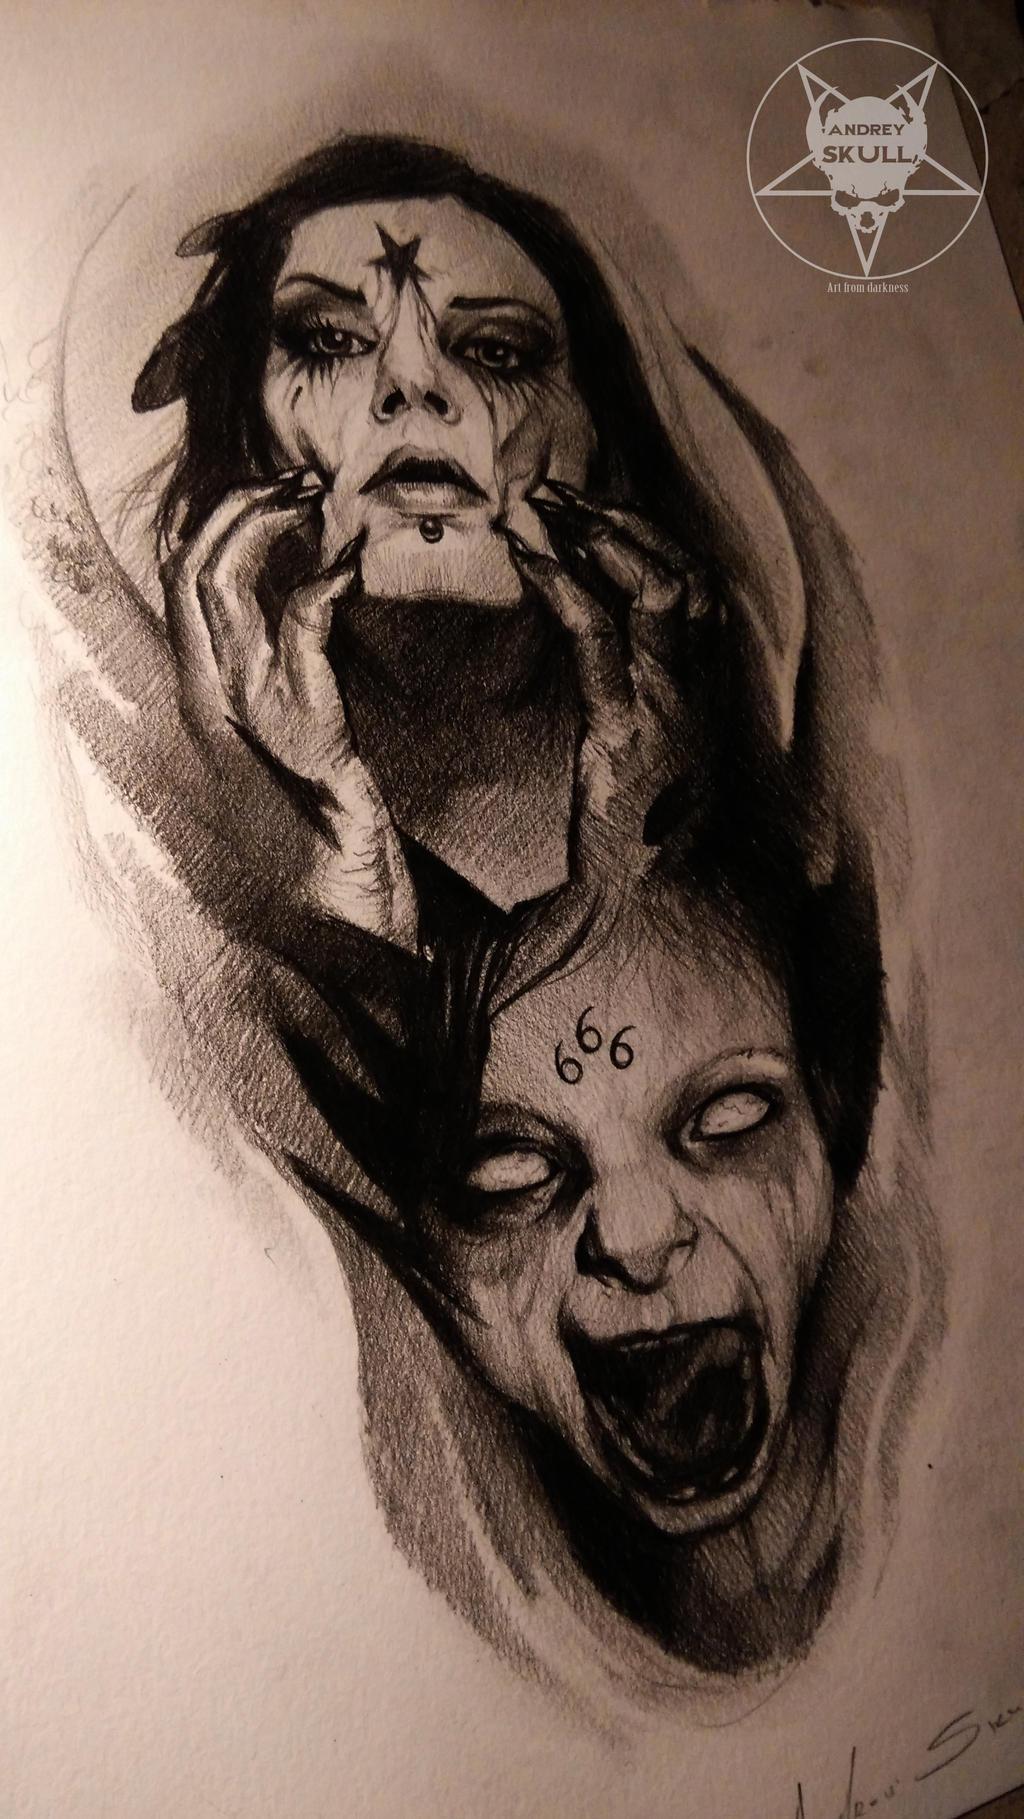 Satanic ii by andreyskull on deviantart for Satanic tattoo designs